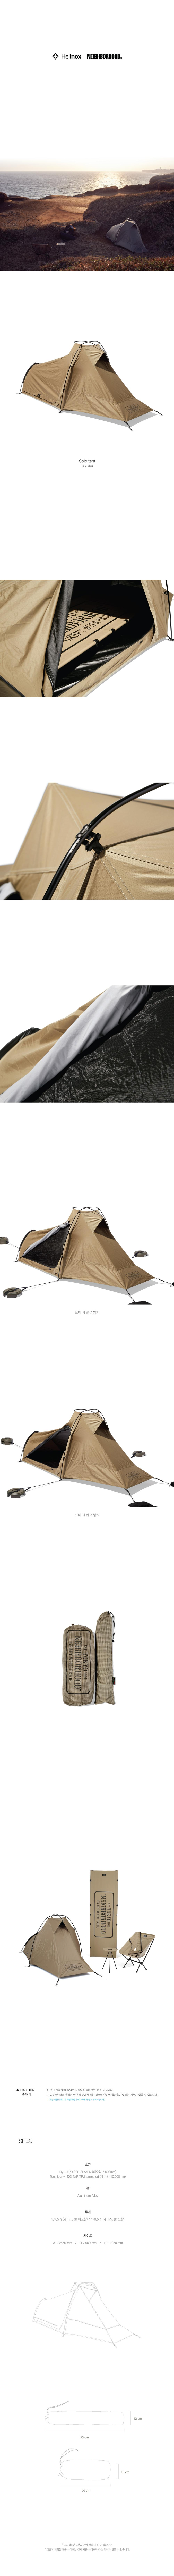 20180416-neighborhood-4th-tent.jpg